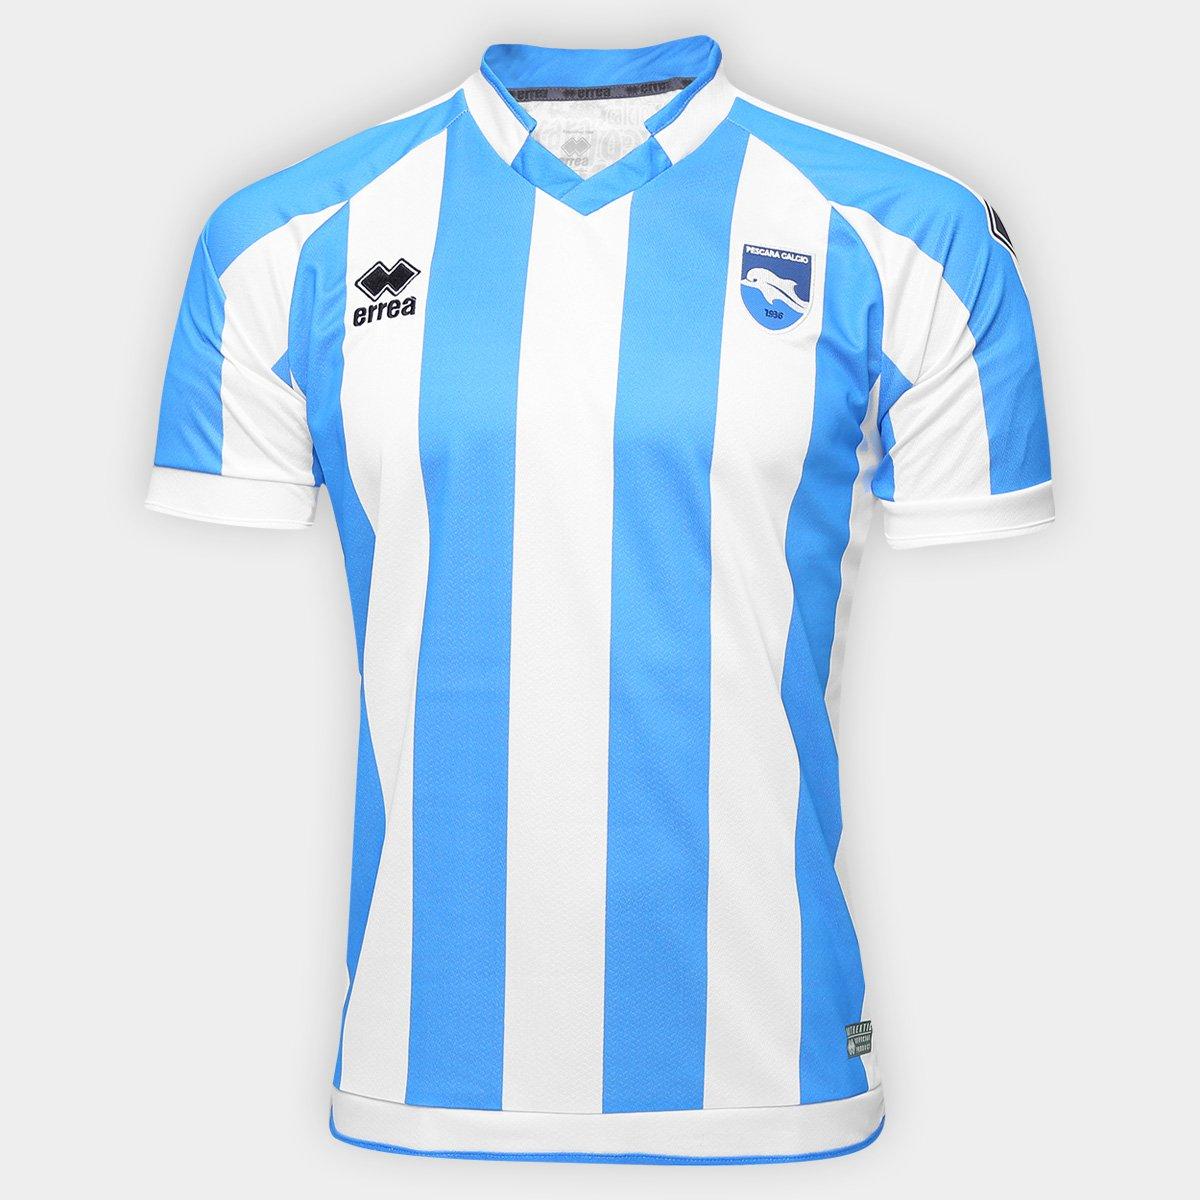 f765def09f04f Camisa Pescara Home 16 17 s nº Torcedor Errea Masculina - Compre Agora